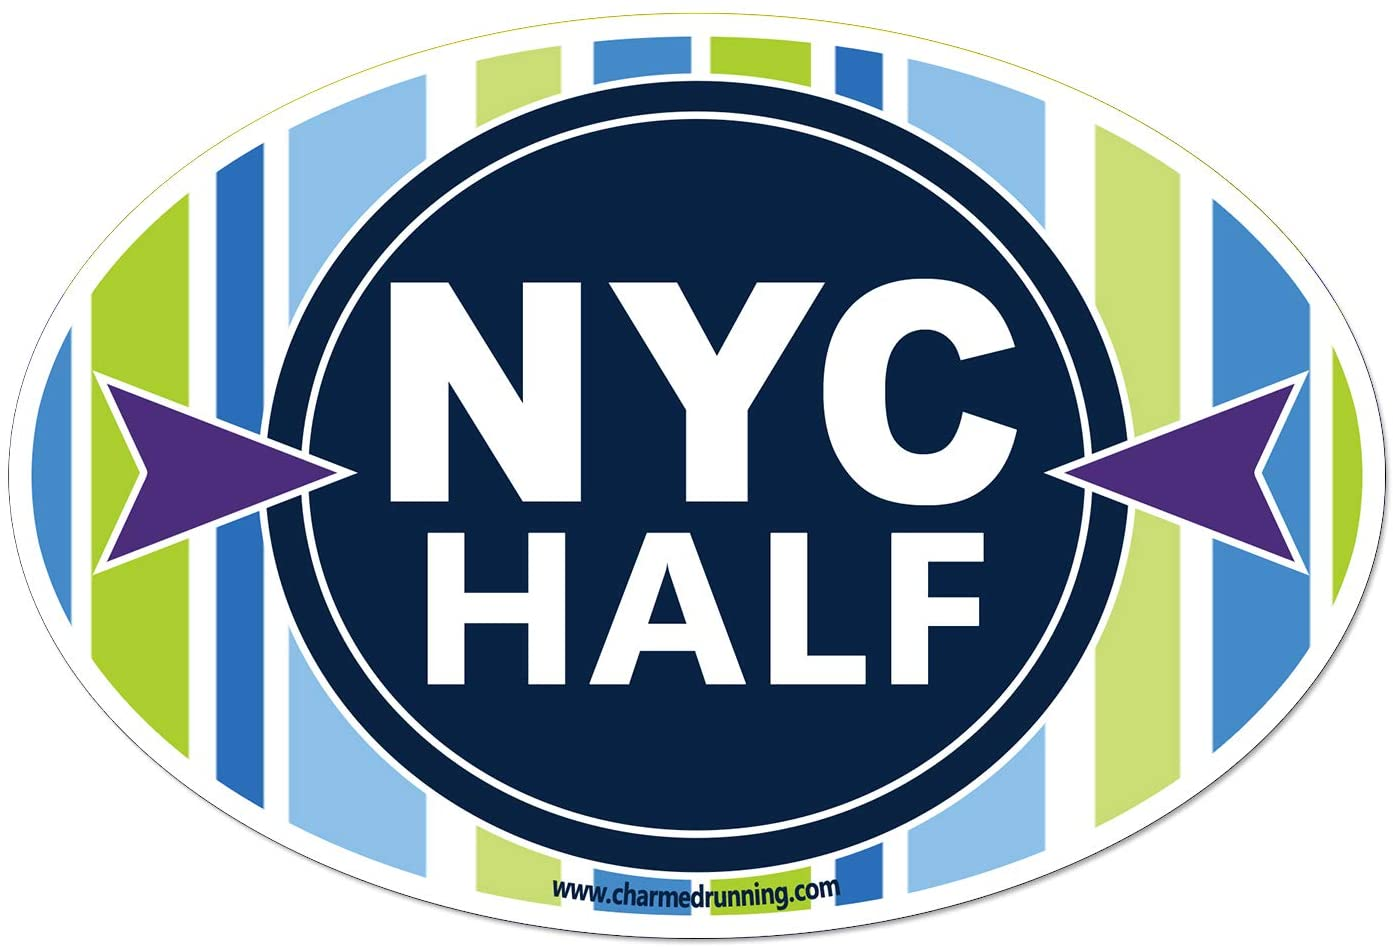 Charmed Running New York City NYC Half Marathon Car Magnet